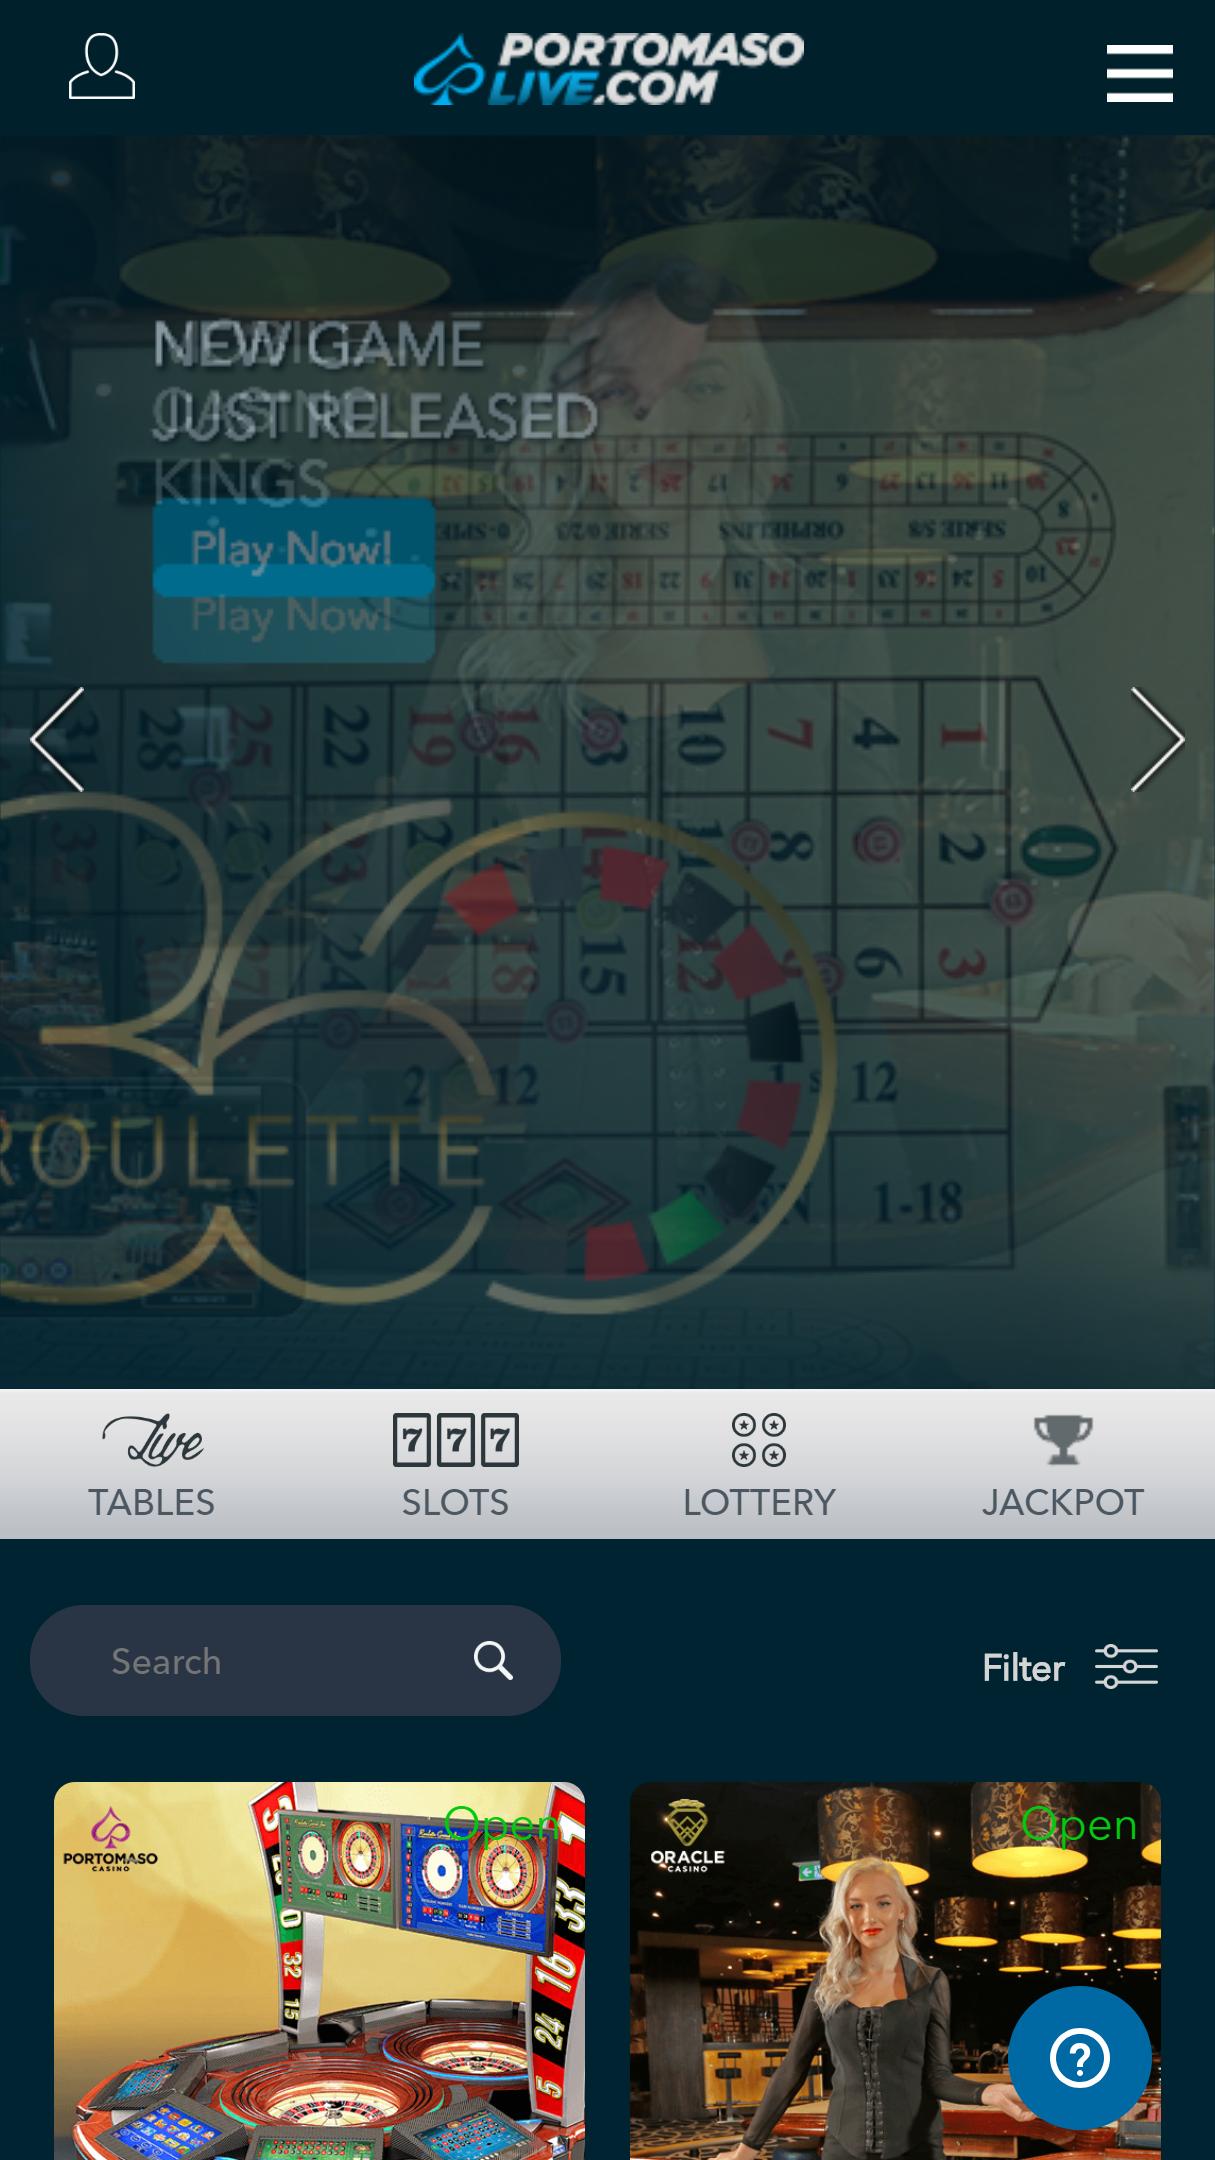 Portomaso Live App Homepage